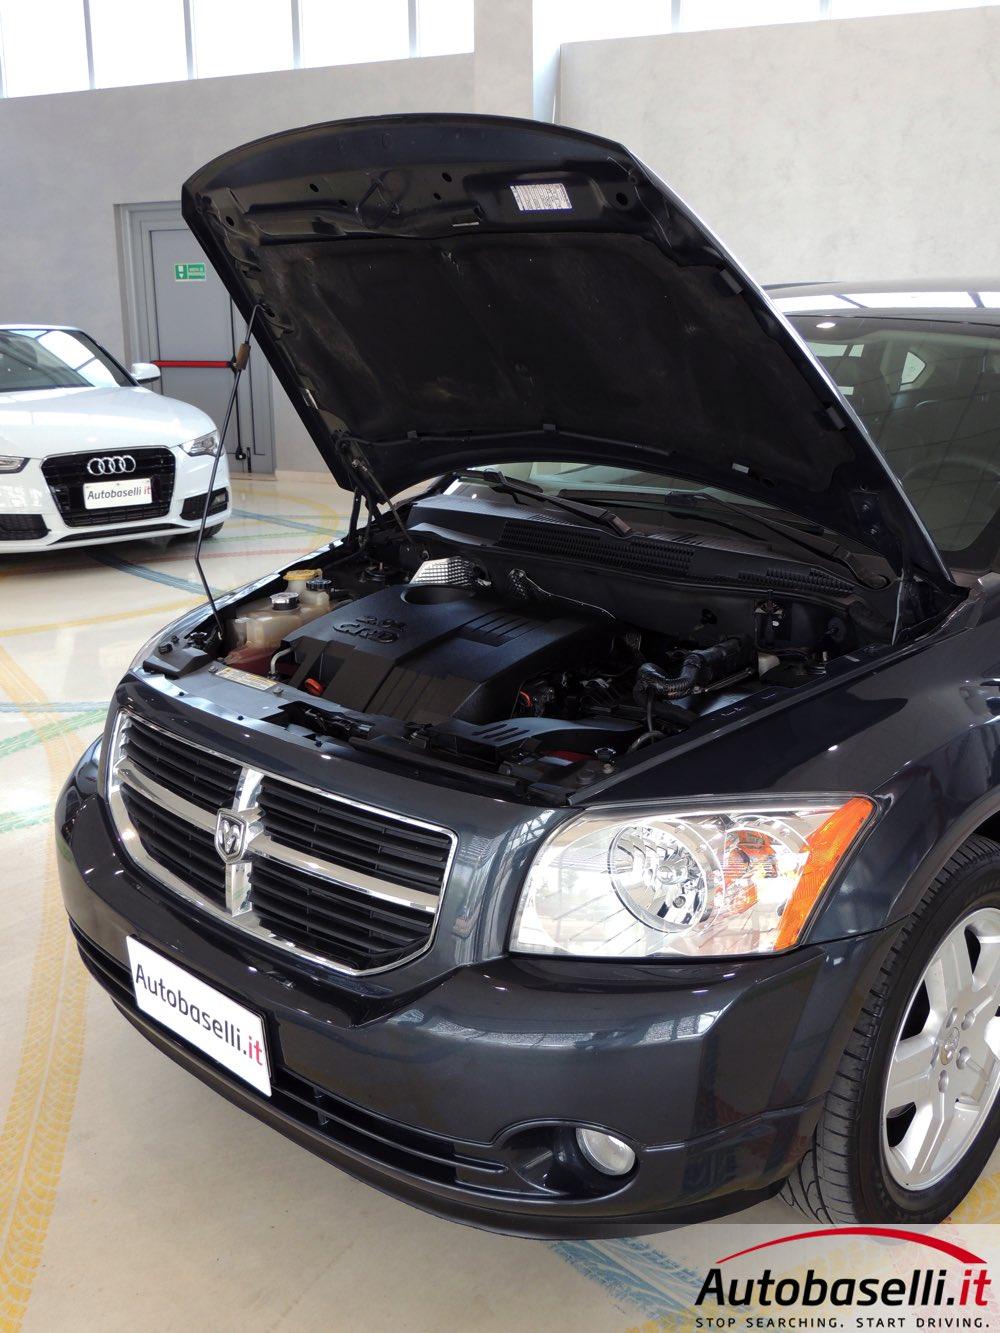 Dodge Caliber 2 0 Td Sxt Leather Interno In Pelle Sedili